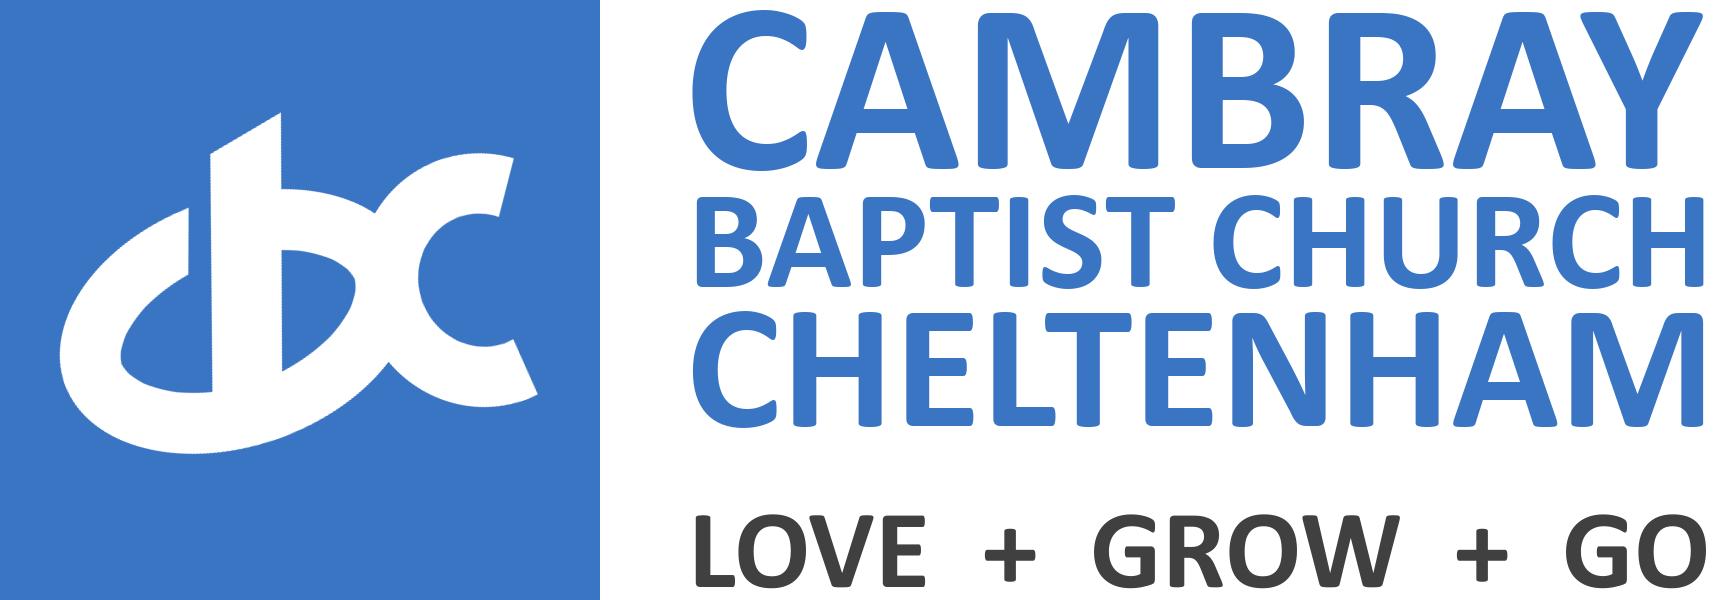 Cambray Baptist Church logo